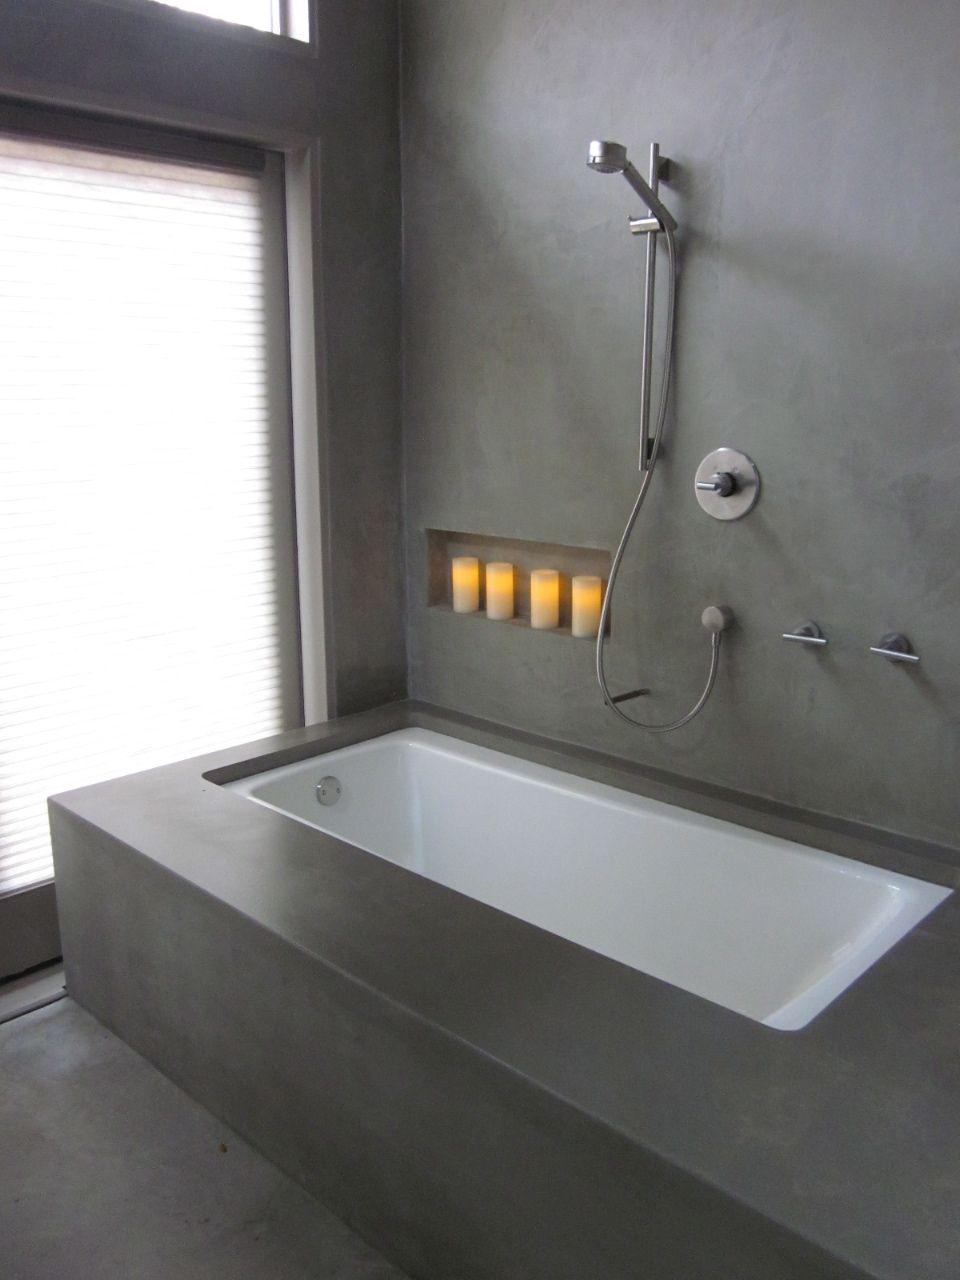 Austin Concrete Countertops | Home Remodel | Pinterest | Concrete ...